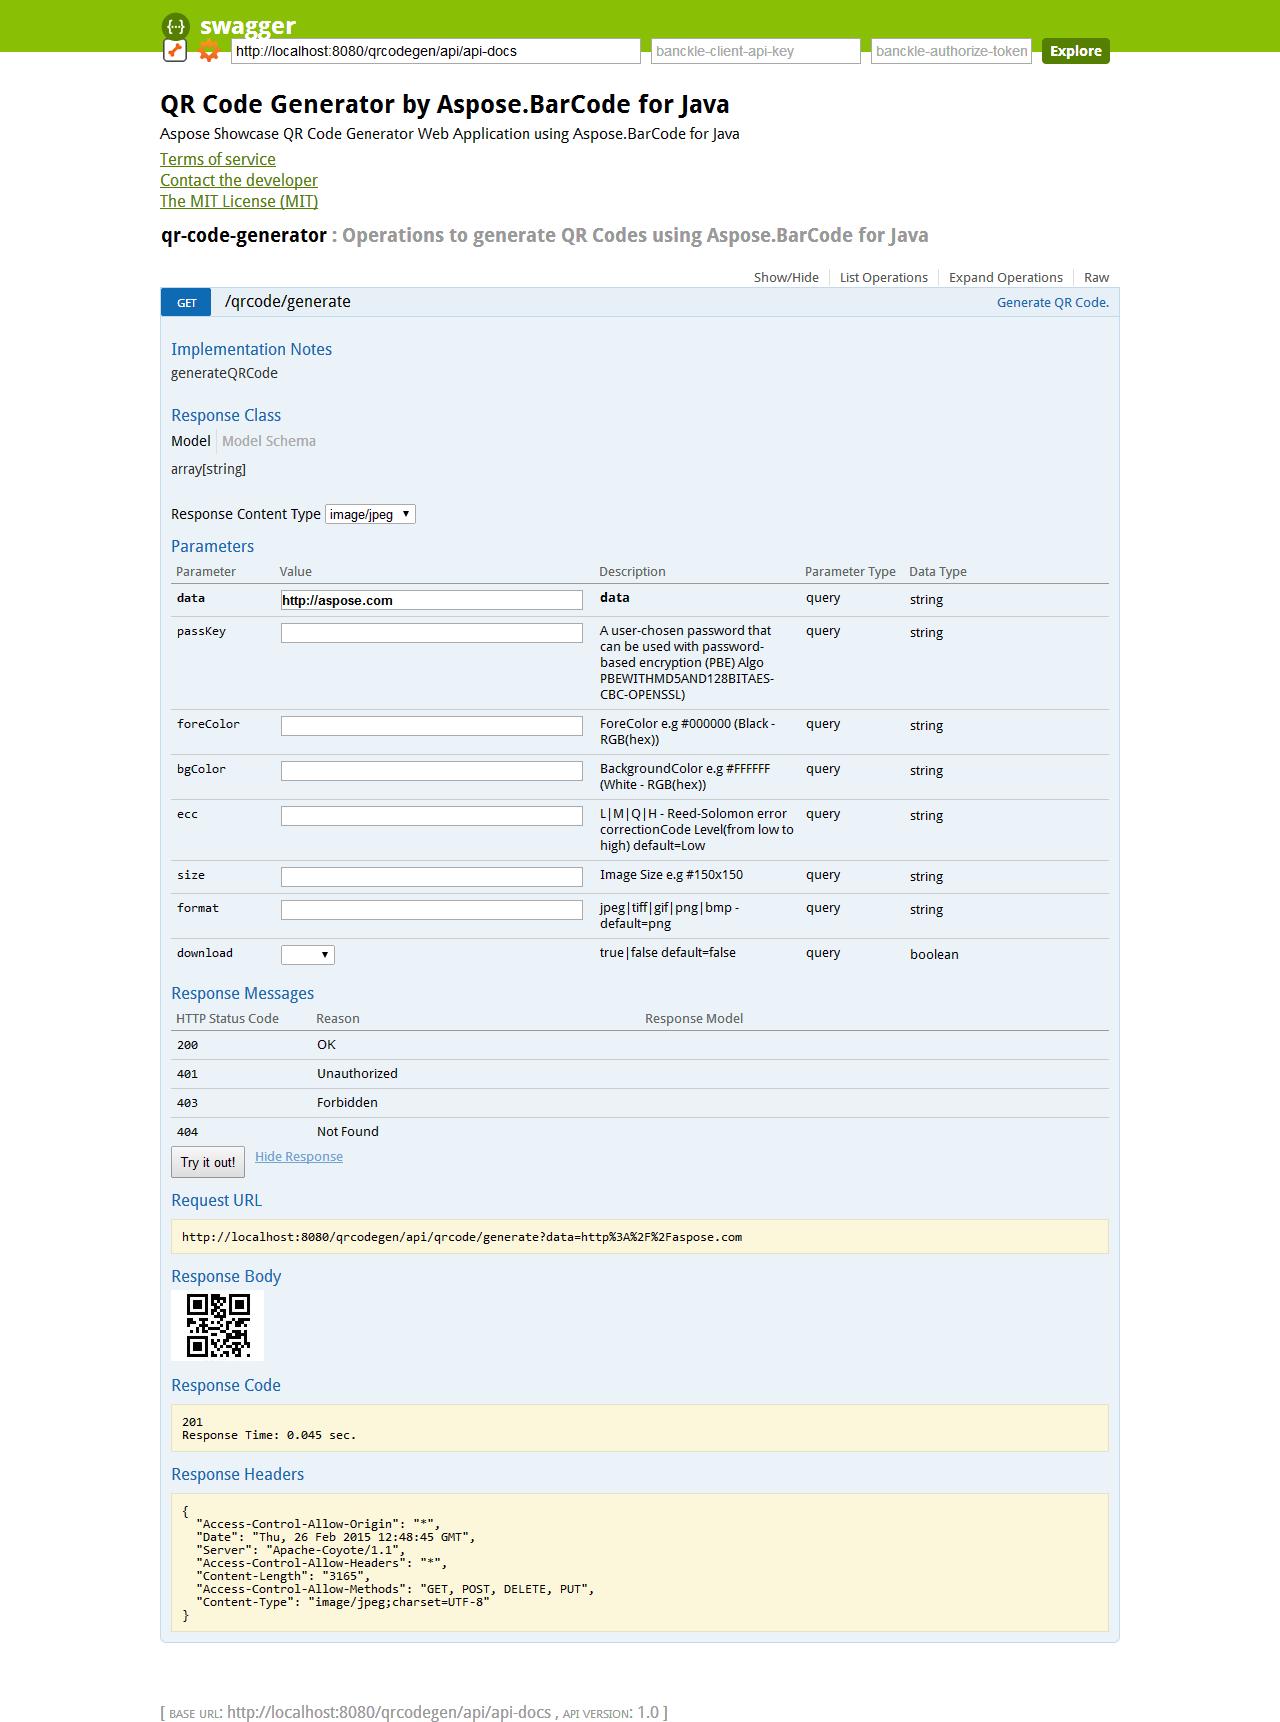 aspose showcase qrcodegen swagger api docs QR Code Generator by Aspose.BarCode for Java